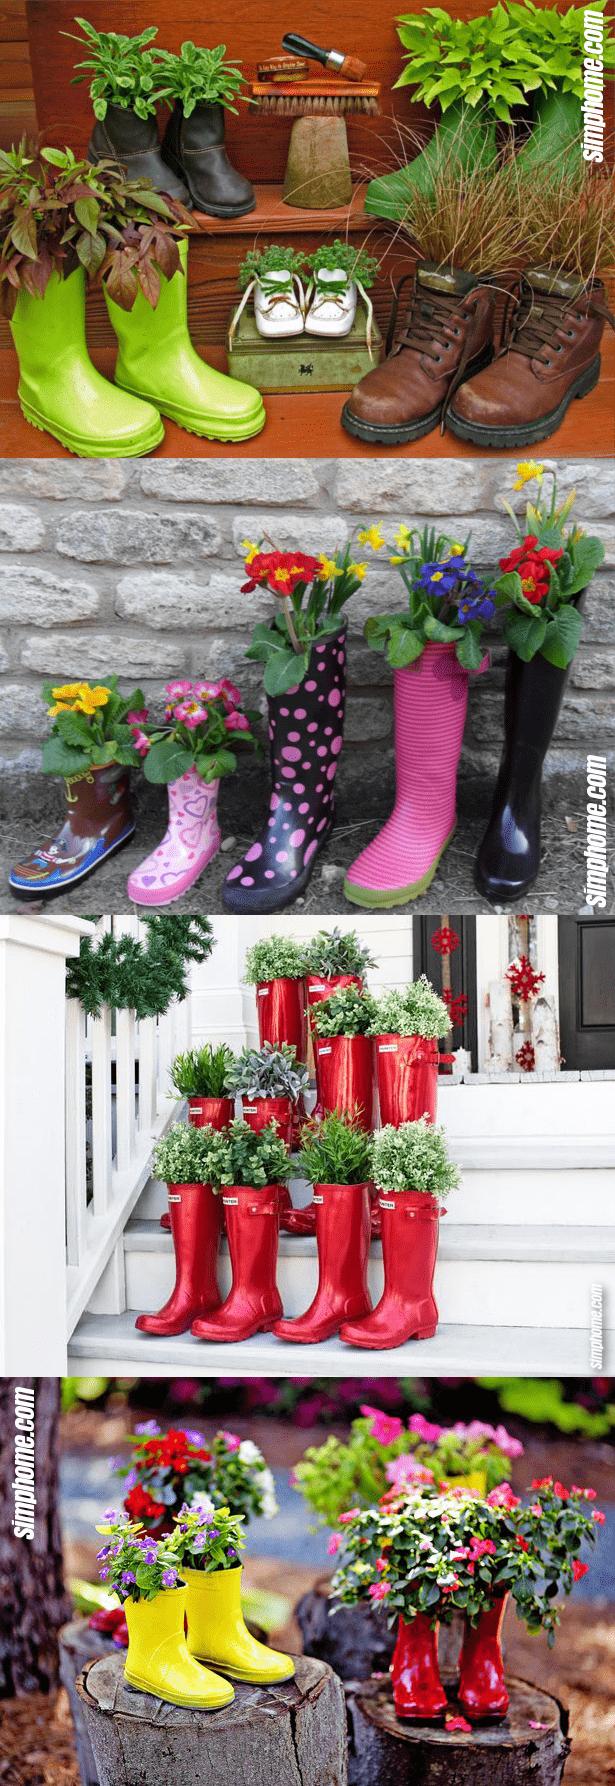 1.Simphome.com Plants in Boots